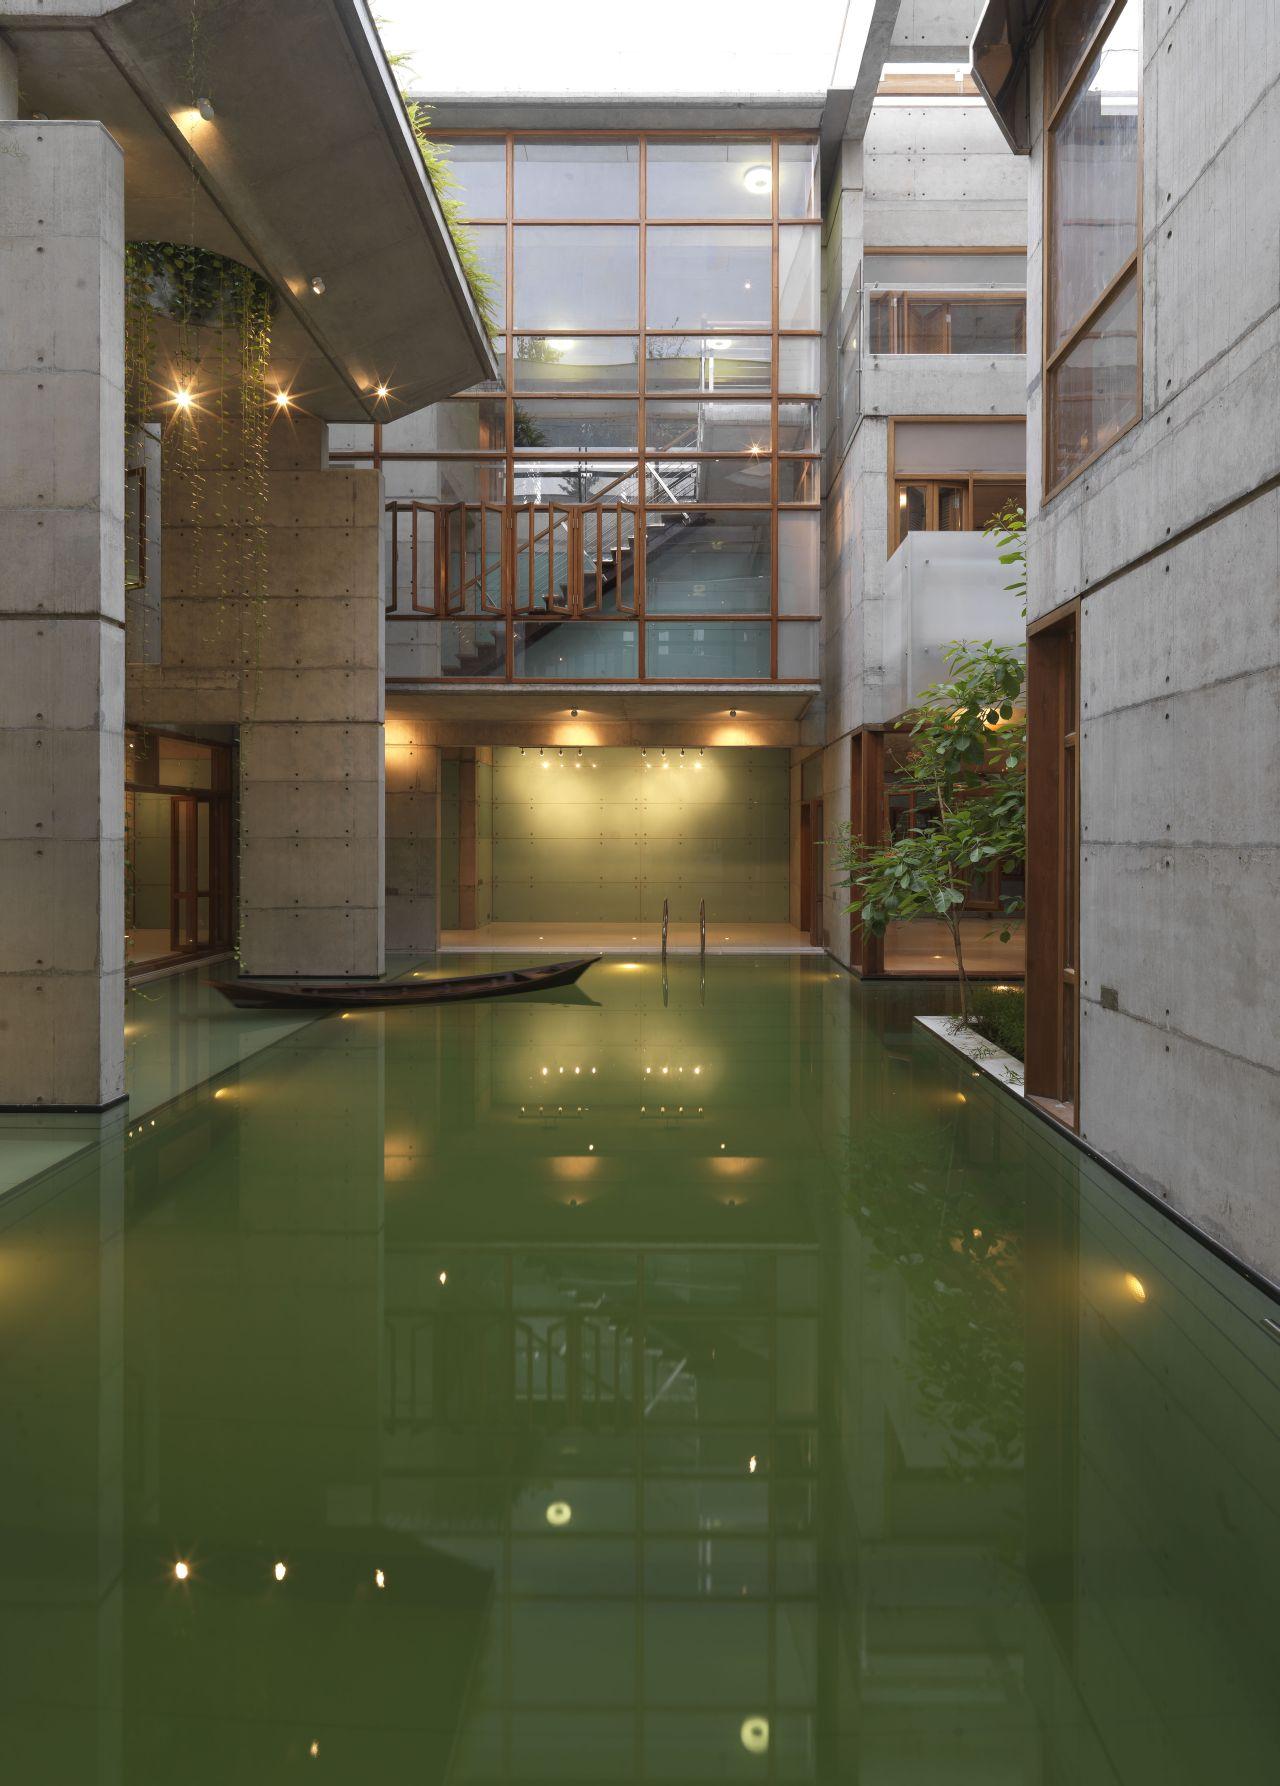 S.A Residence / Shatotto, © Daniele Domenicali